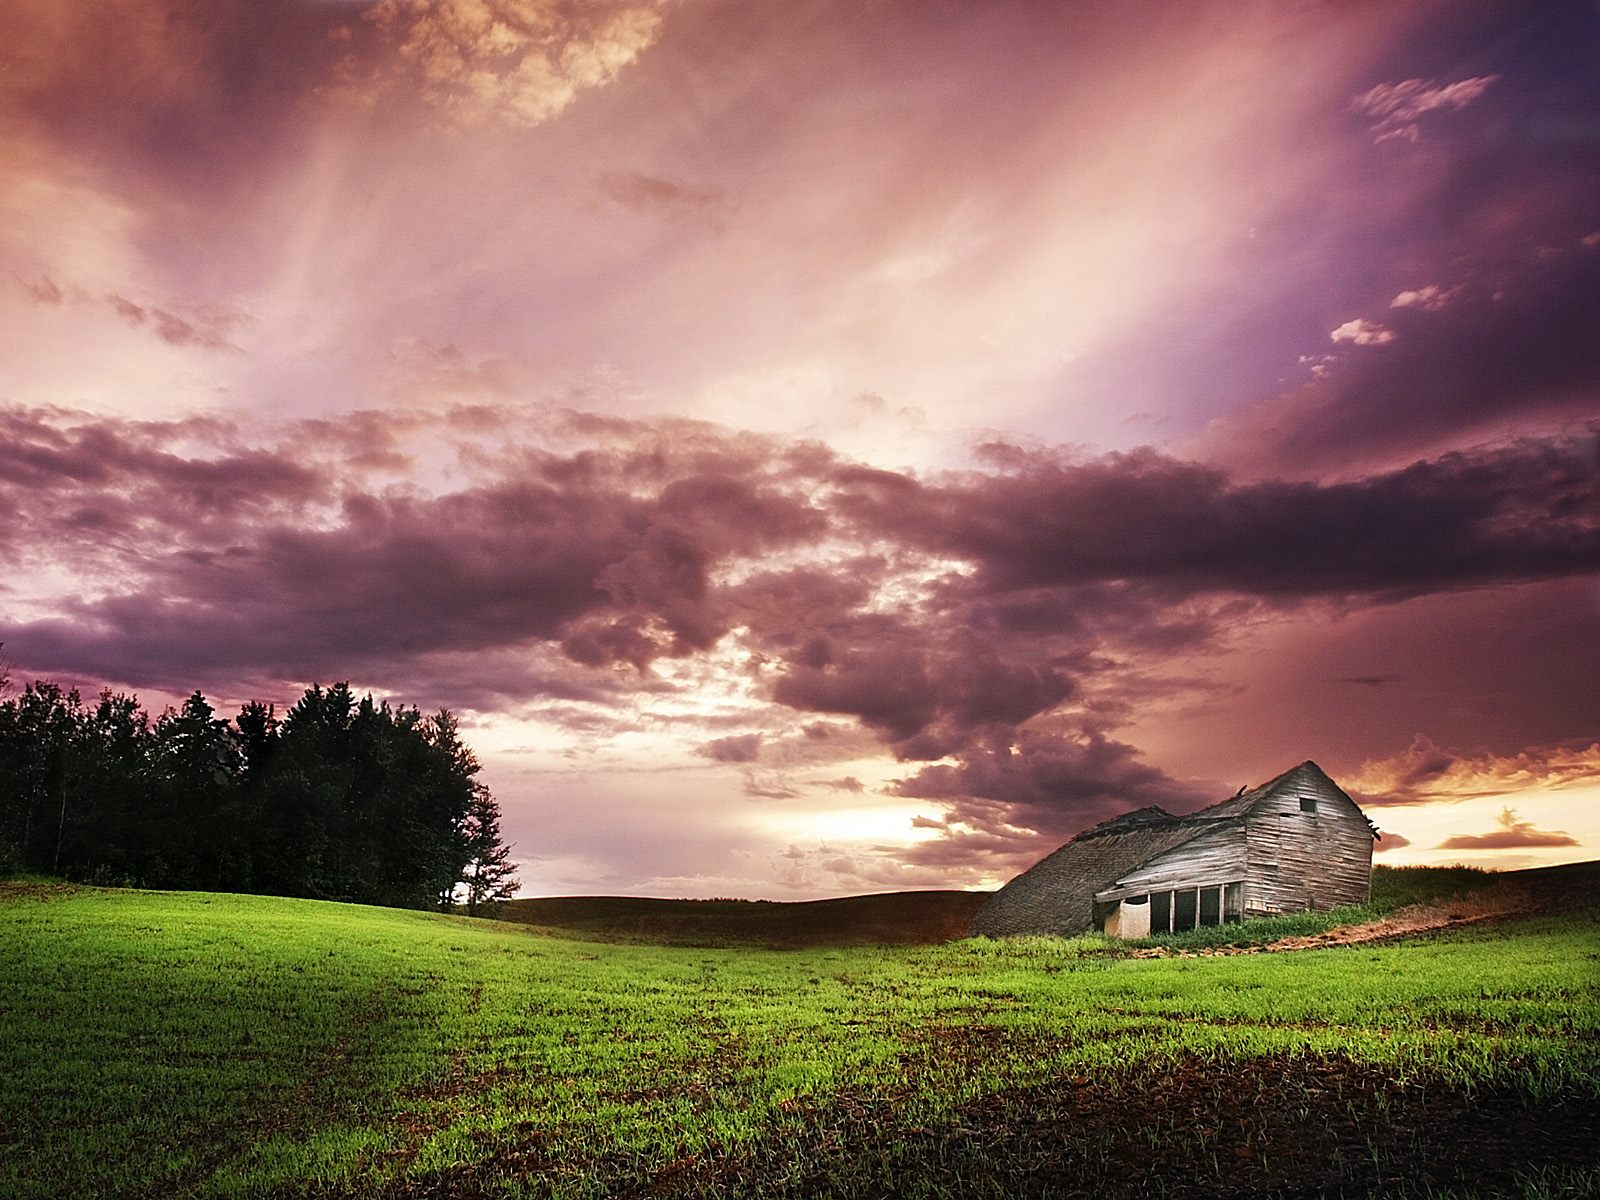 desktop wallpaper: 30 Beautiful Landscape Wallpapers